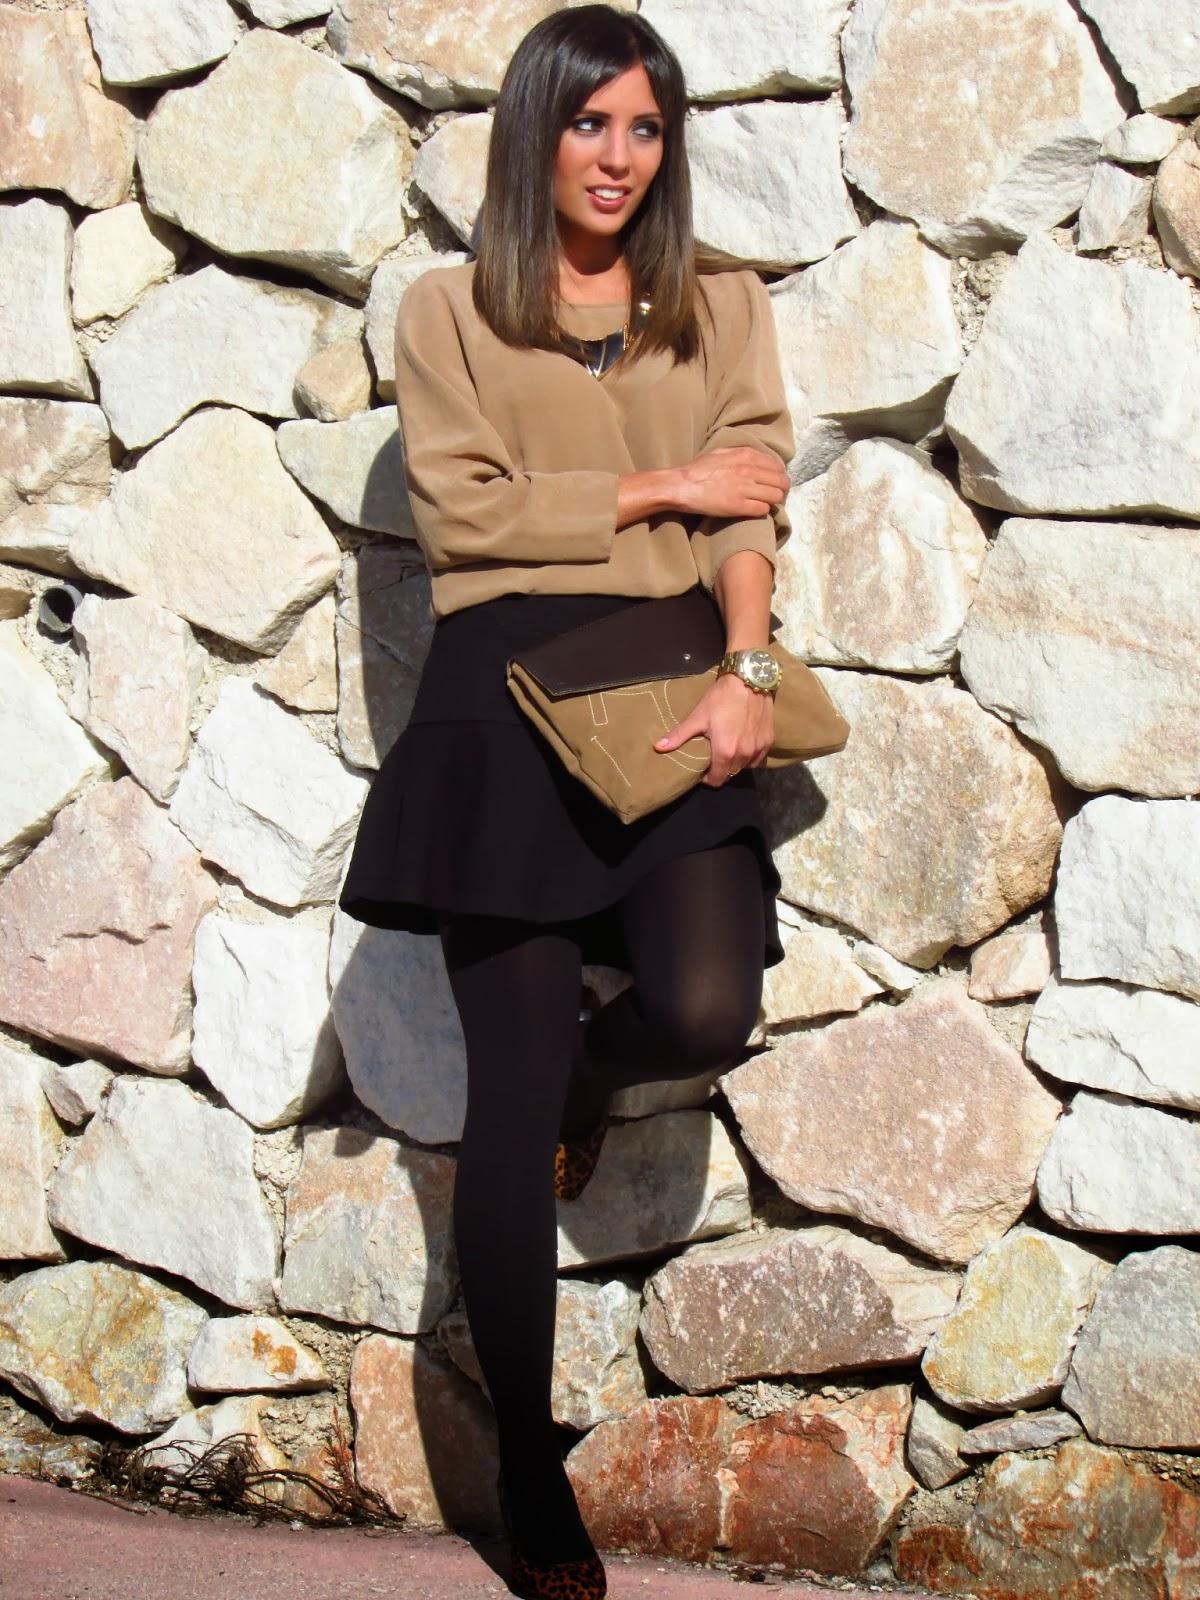 cristina style fashion blogger malagueña tendencias moda ootd outfit look street style